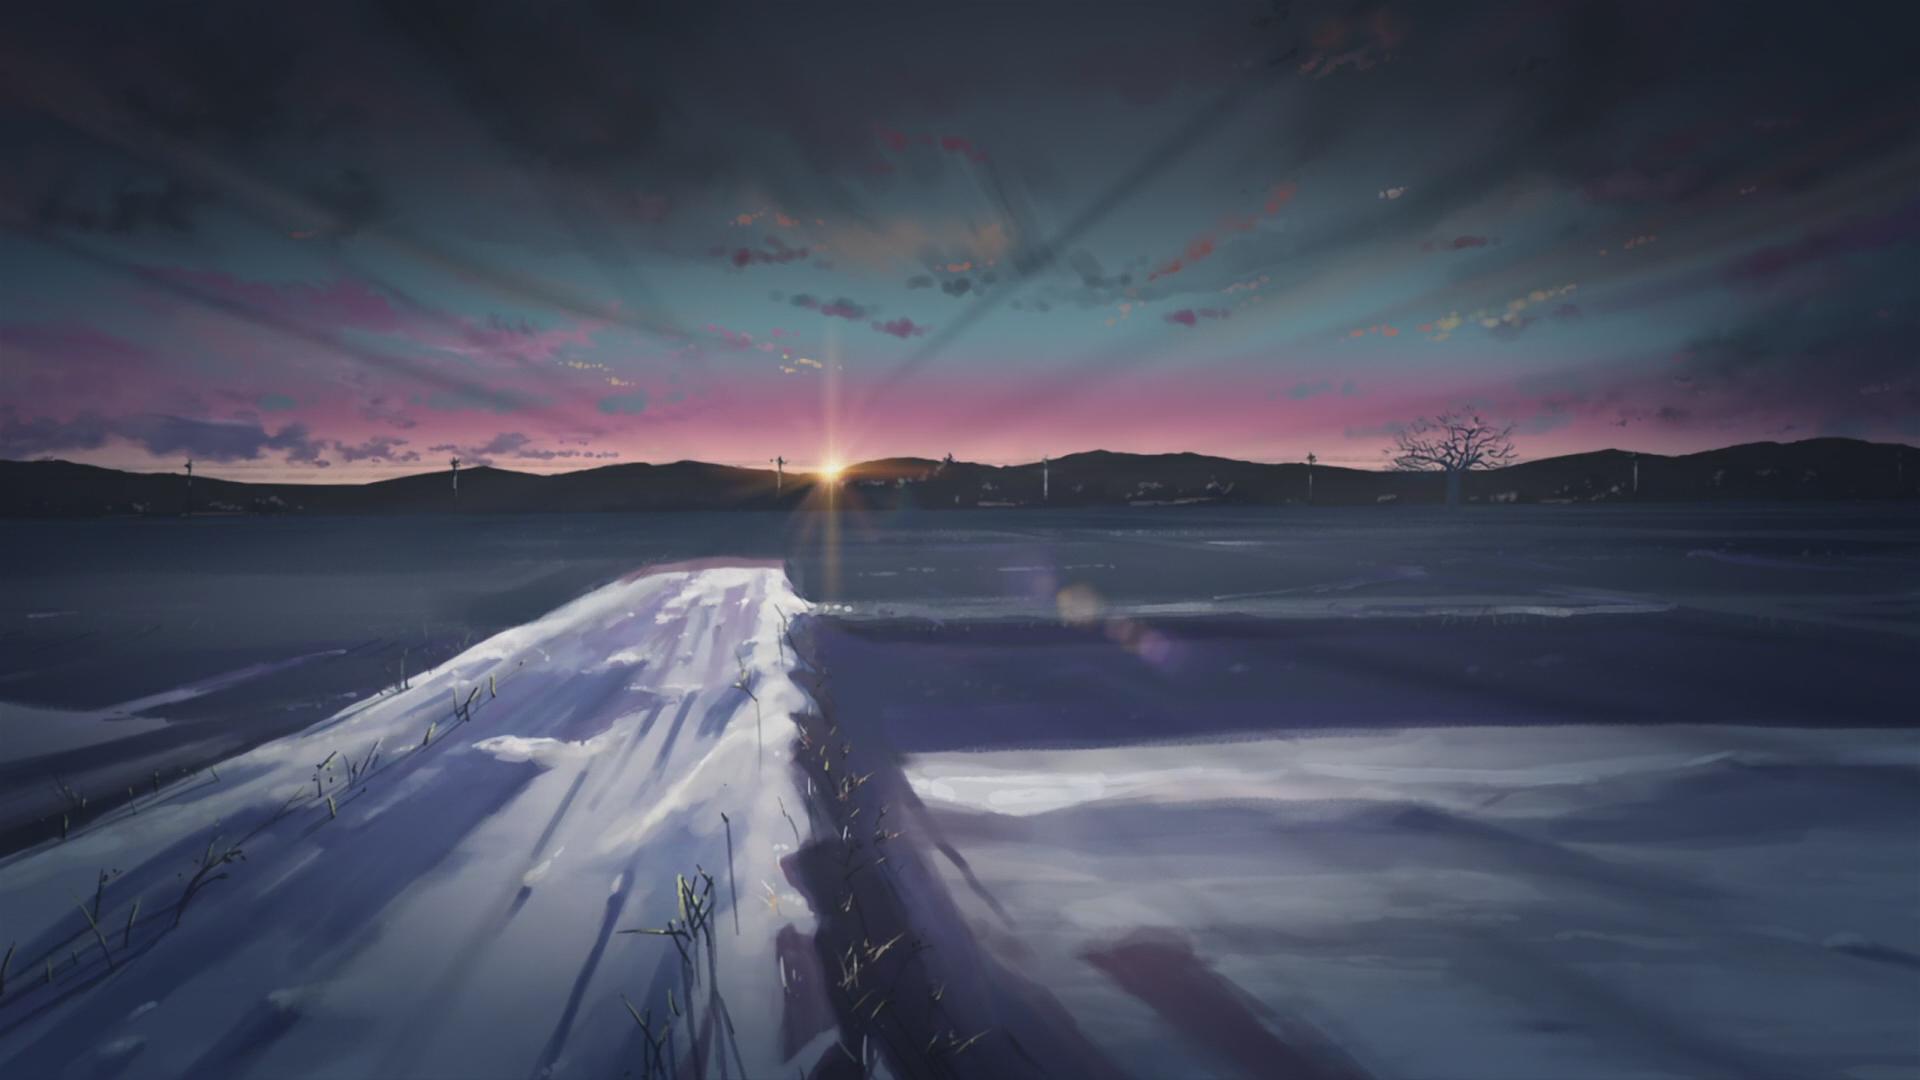 5 Centimeters Per Second Makoto Shinkai Hd Wallpaper 162805